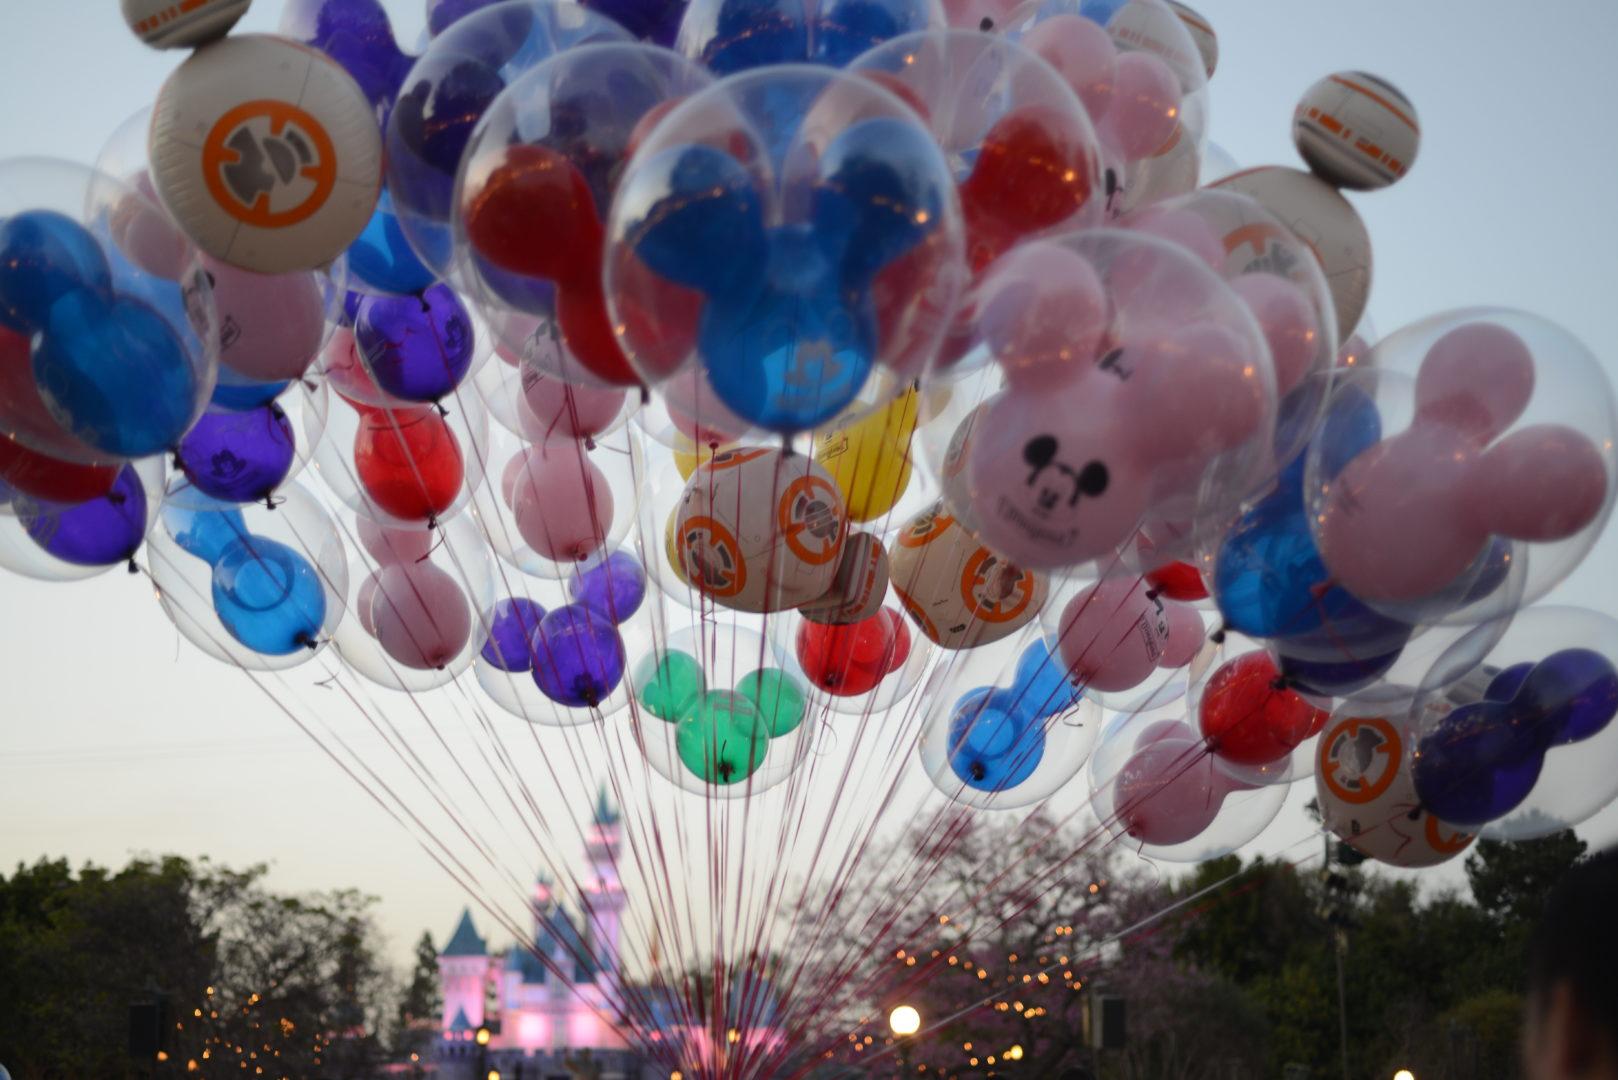 Huge Bouquet of Disneyland Balloons in front of Sleeping Beauty Castle at Dusk